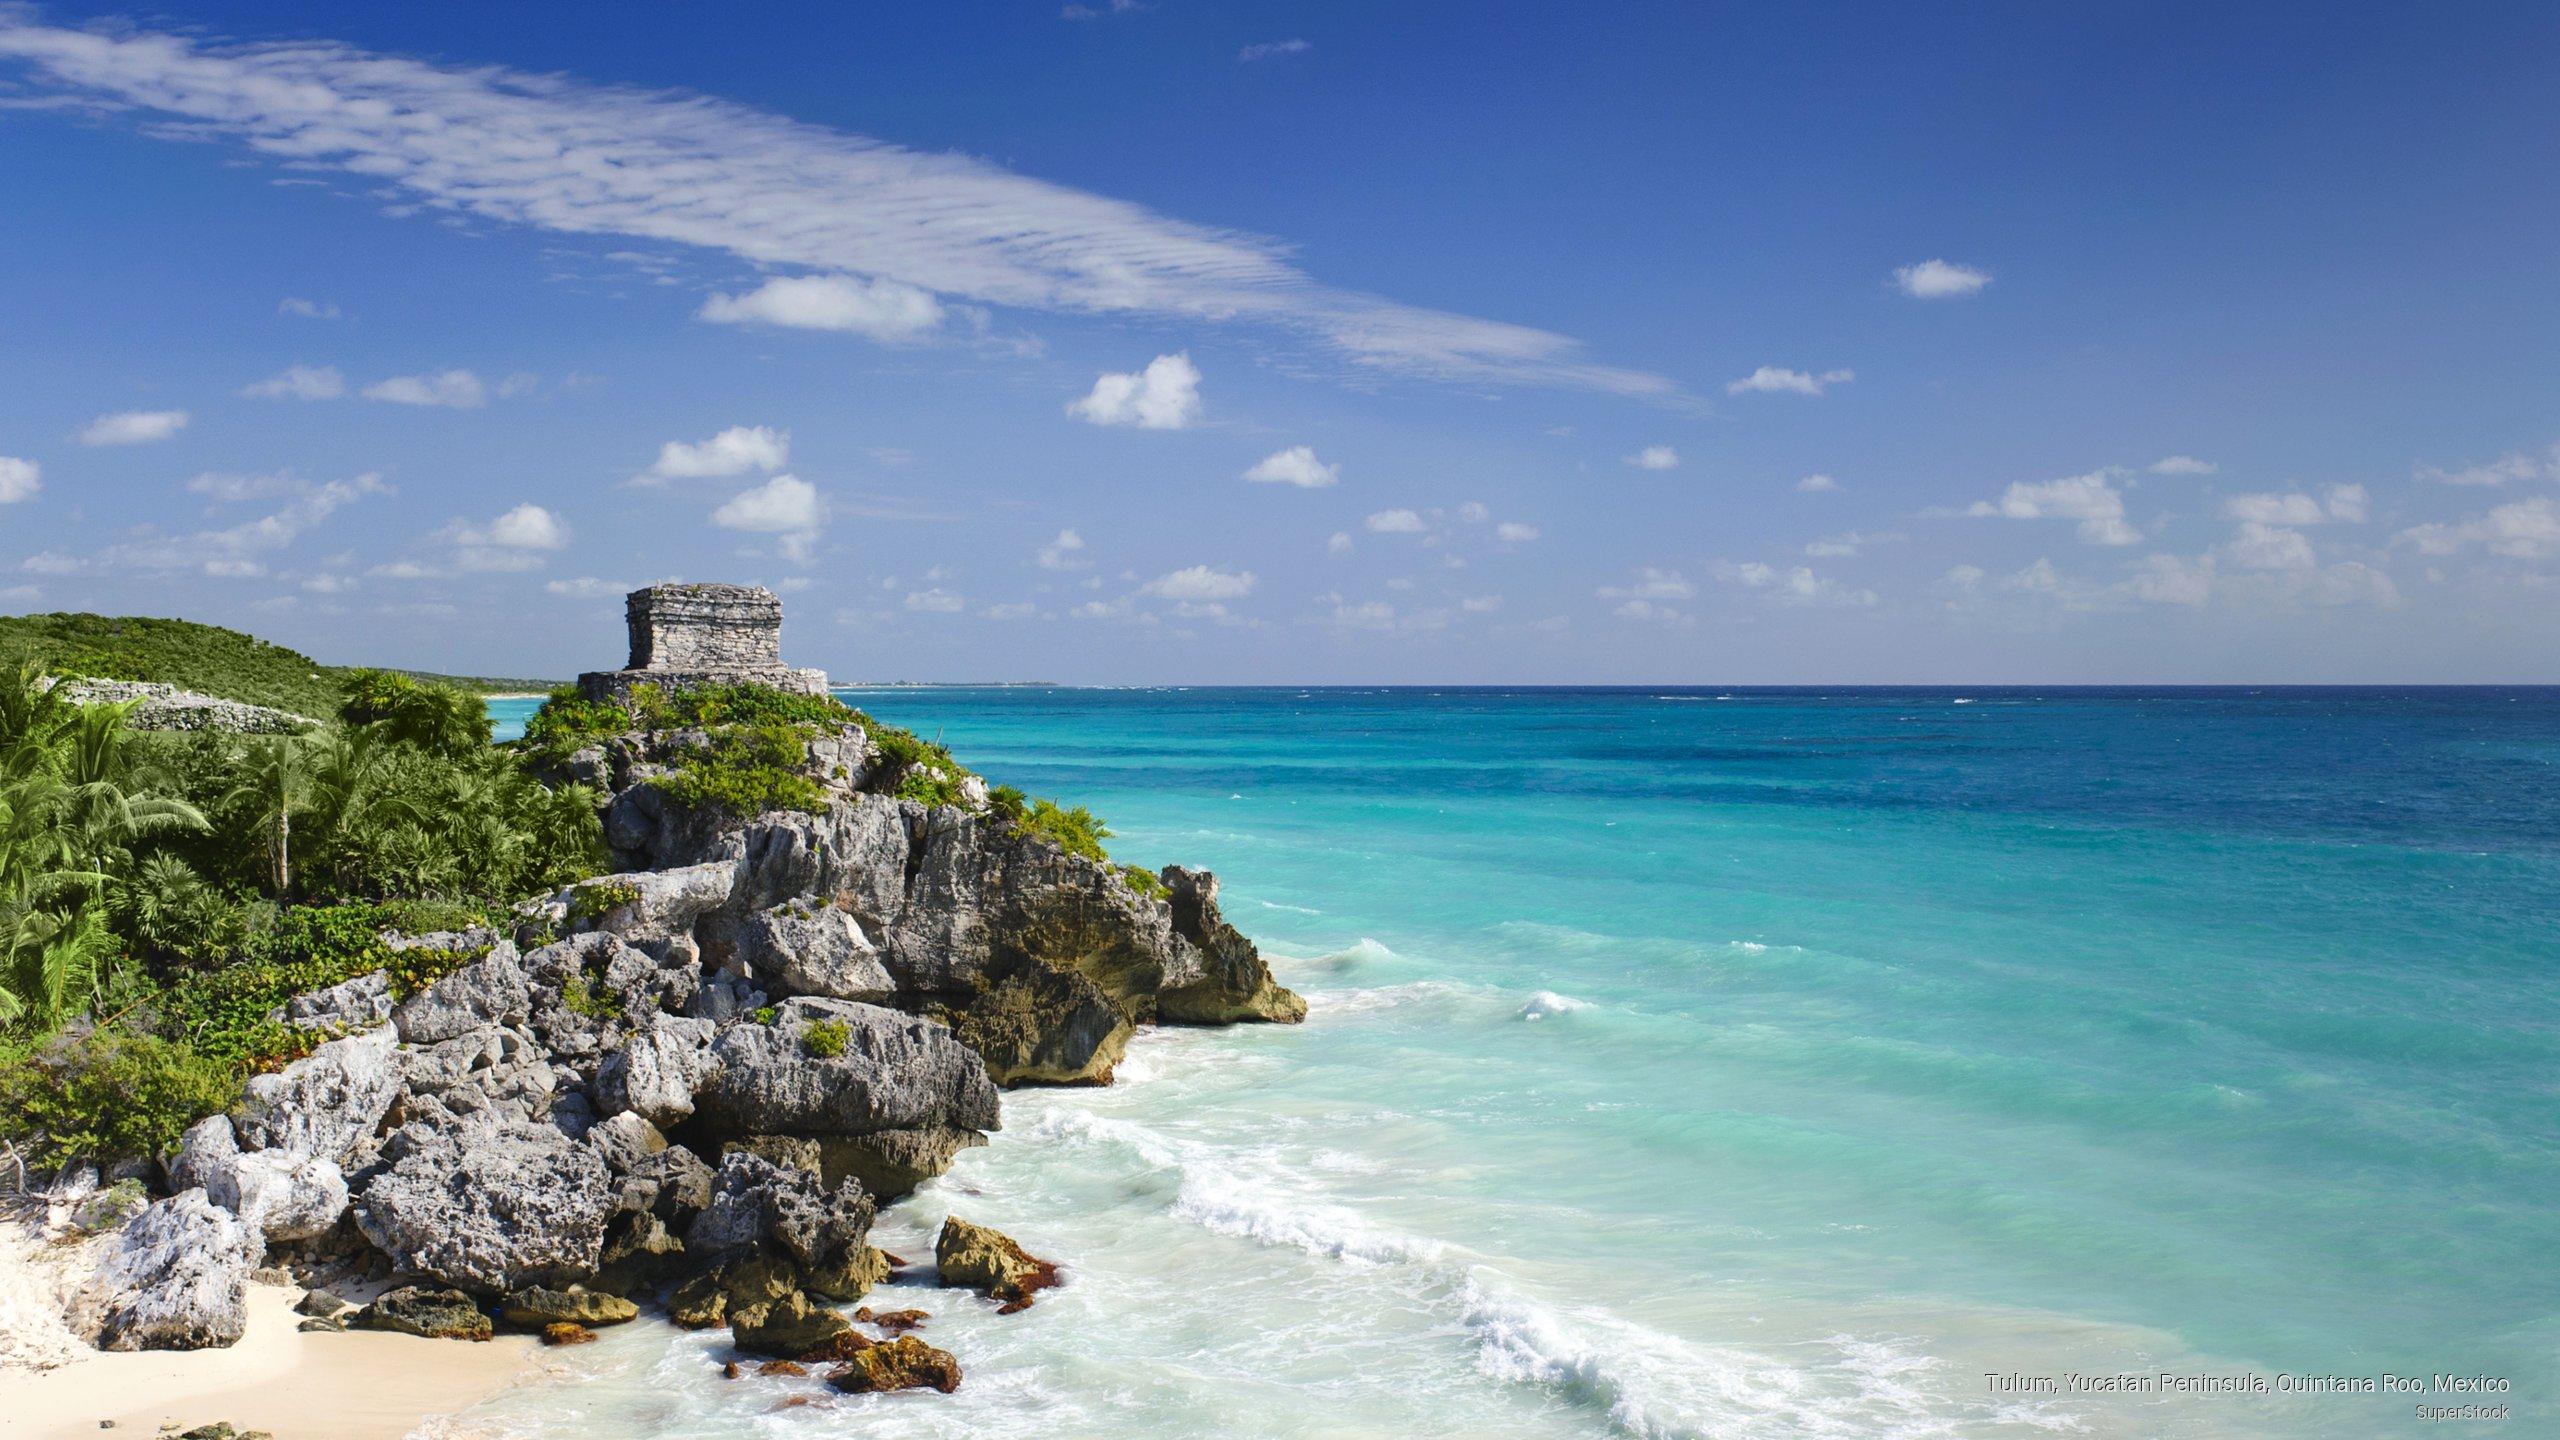 Download Webshots Tulum Yucatan Peninsula Quintana Roo Mexico 2560x1440